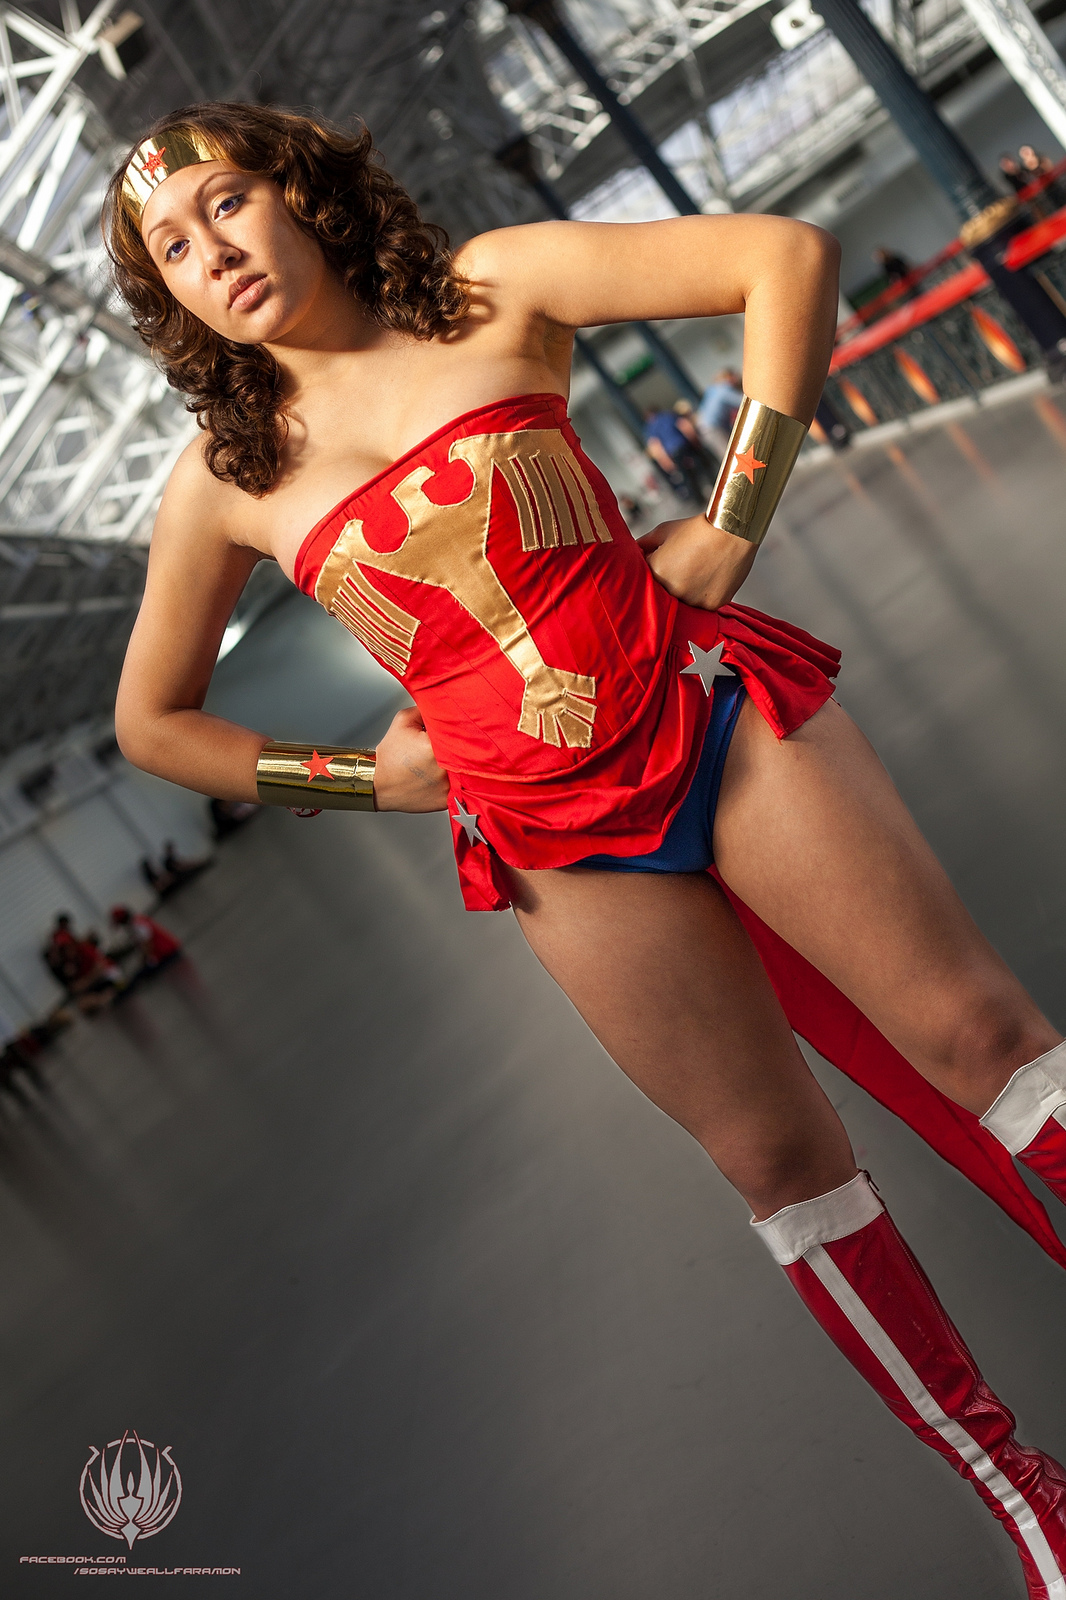 Wonder Woman - Standing Tall by faramon